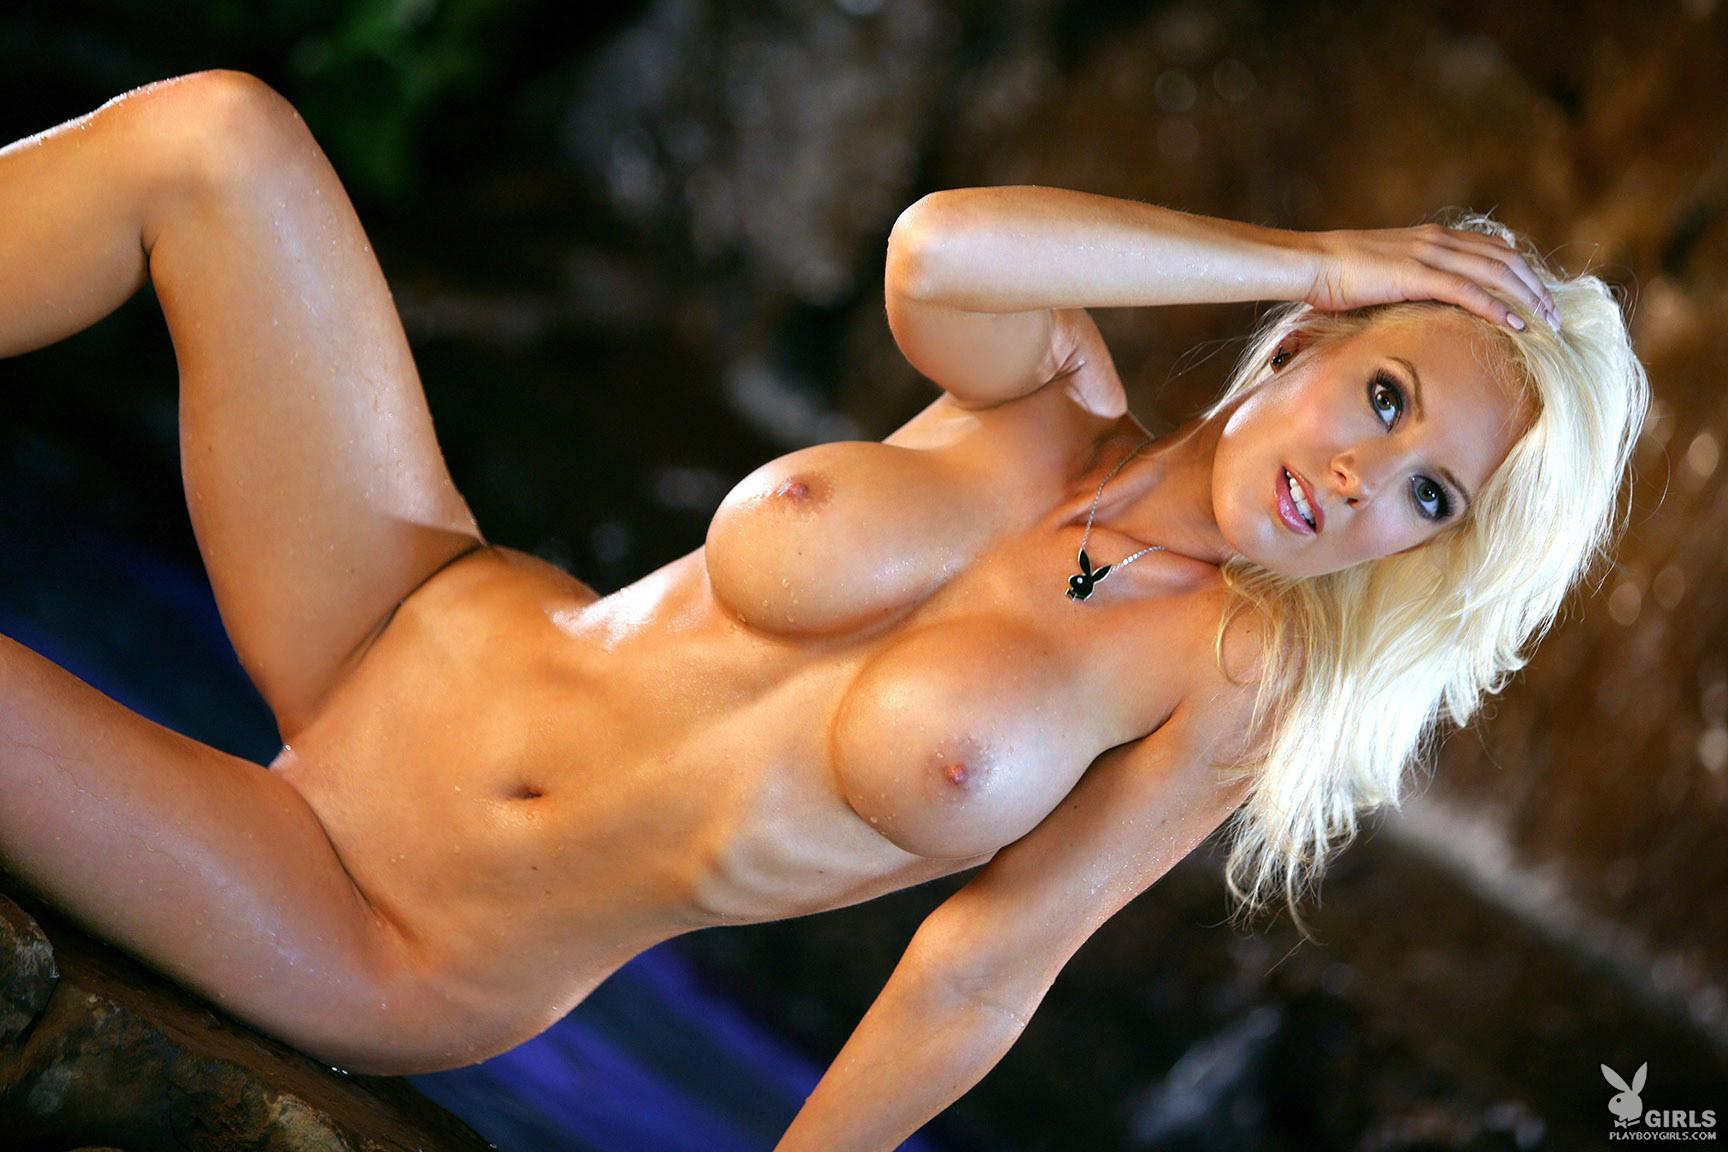 hot porno girl comes to earth